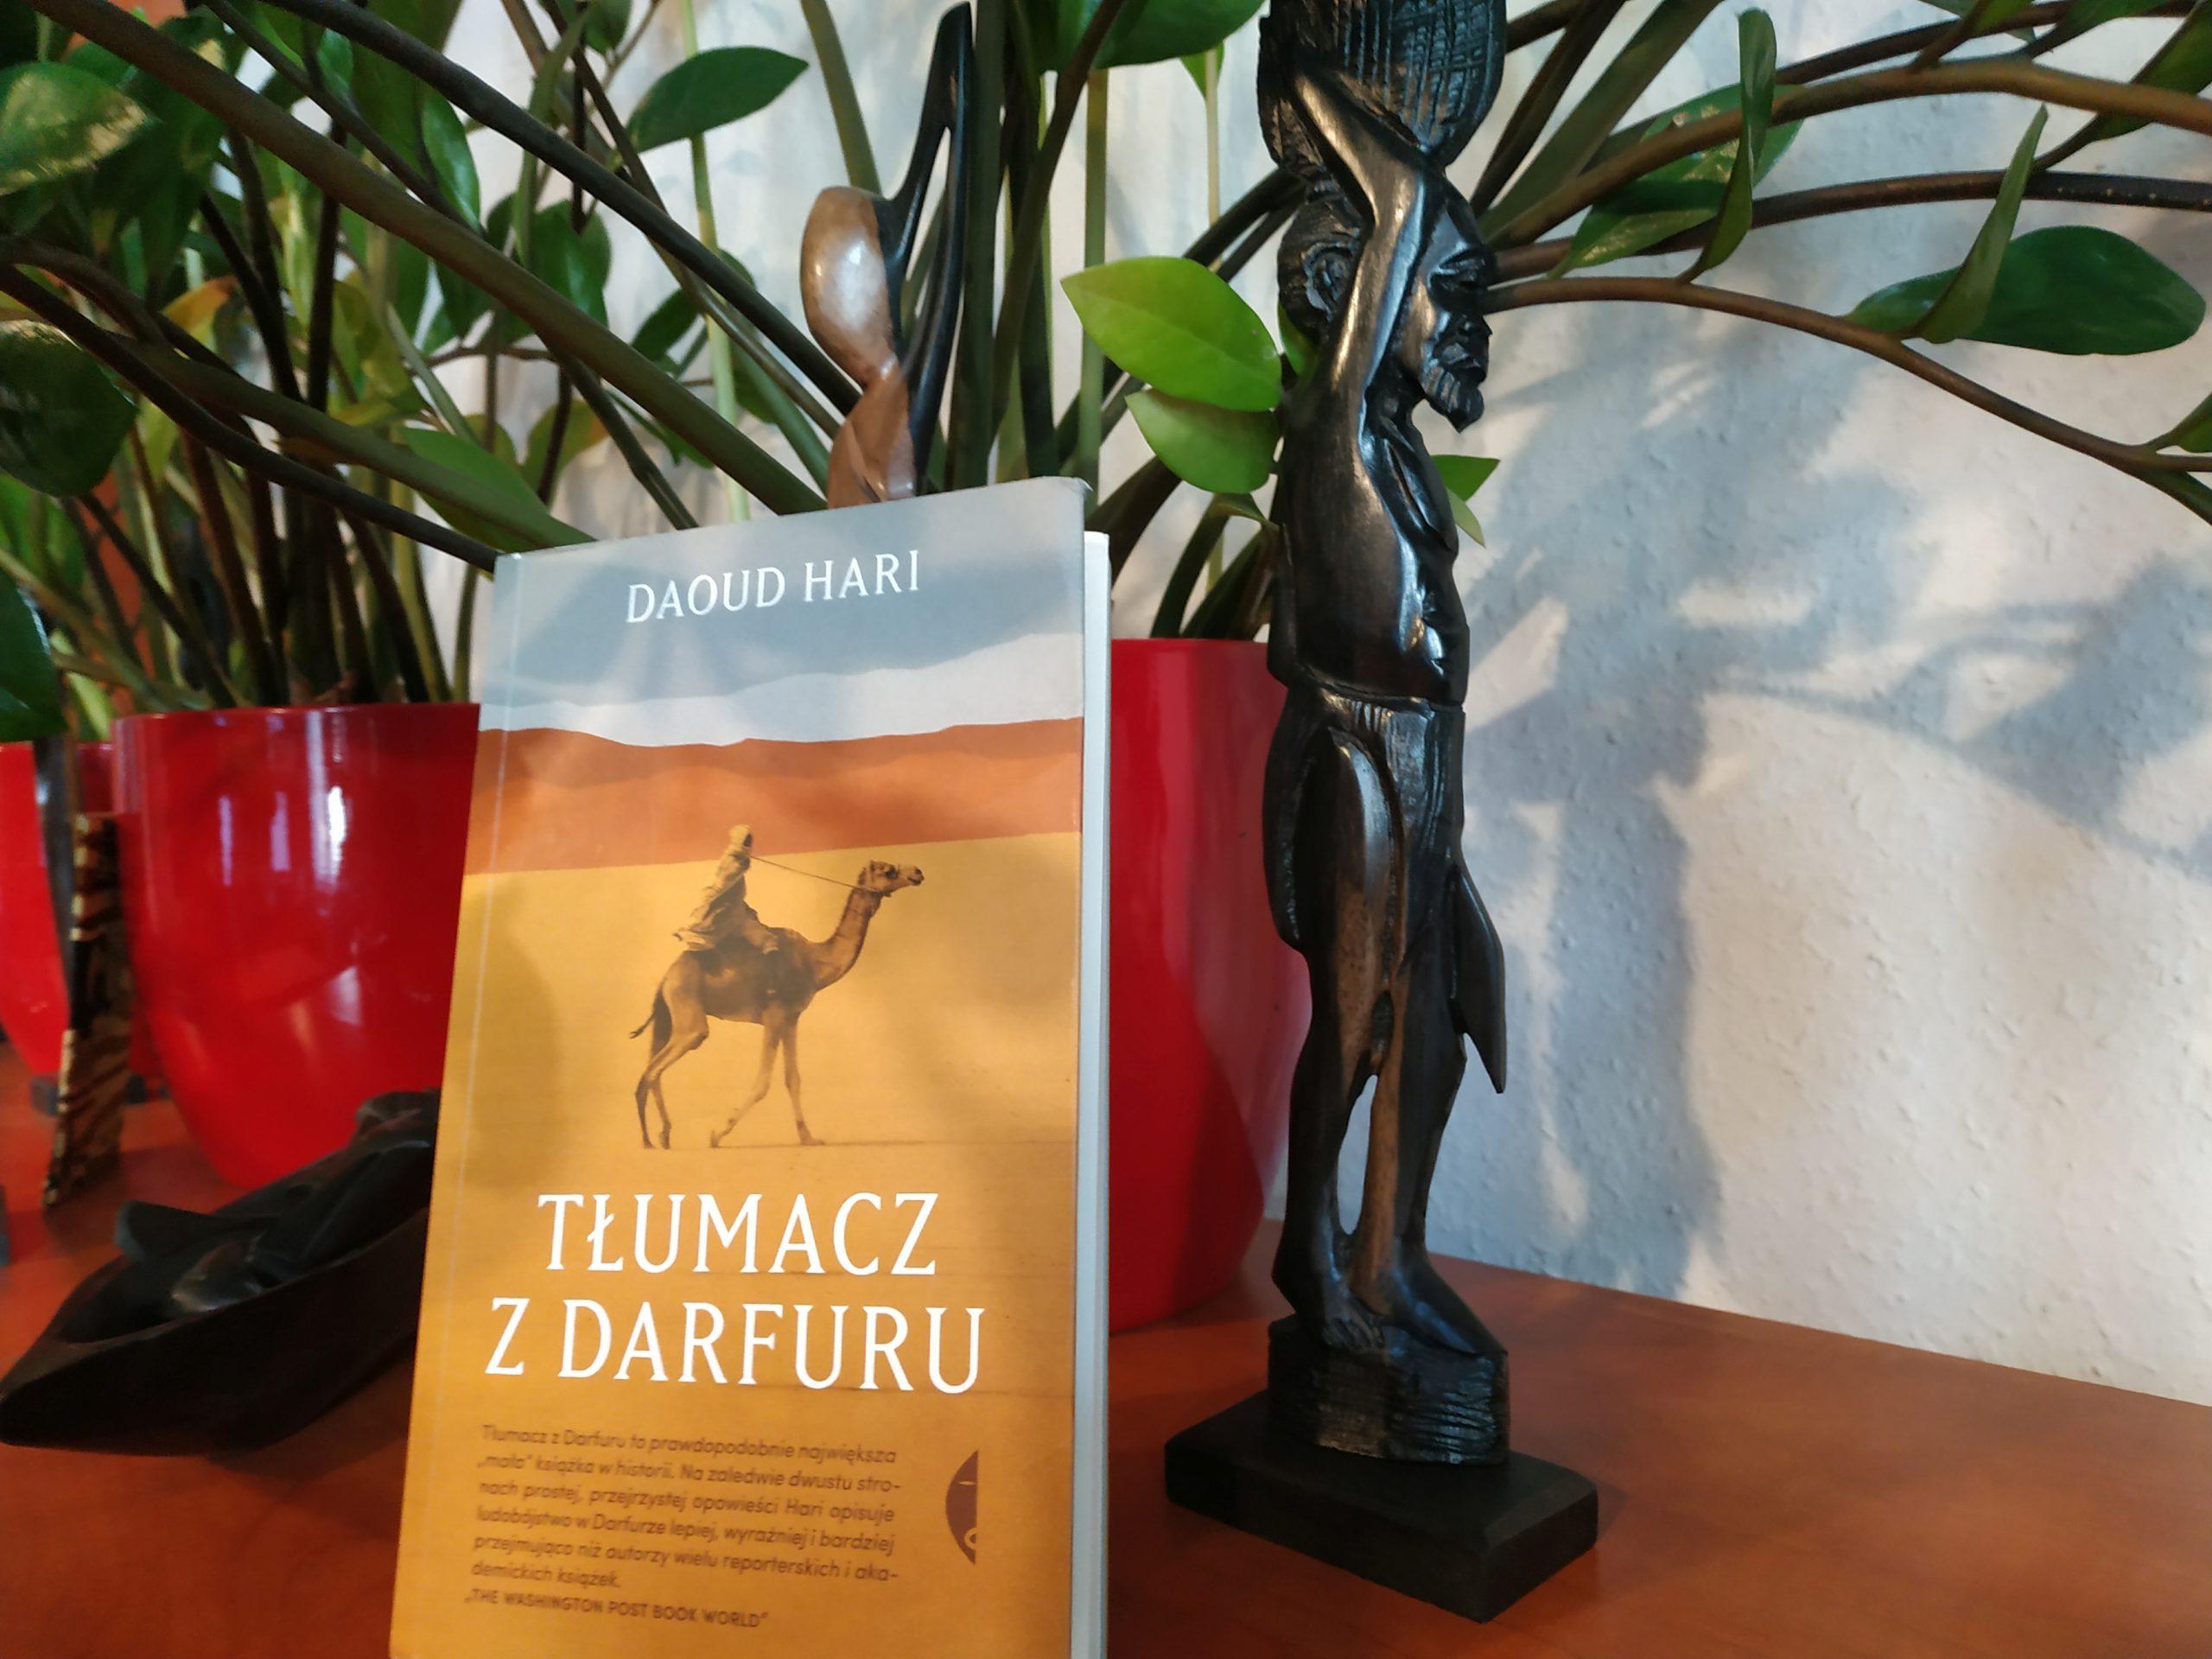 Daoud Hari, Tłumacz z Darfuru